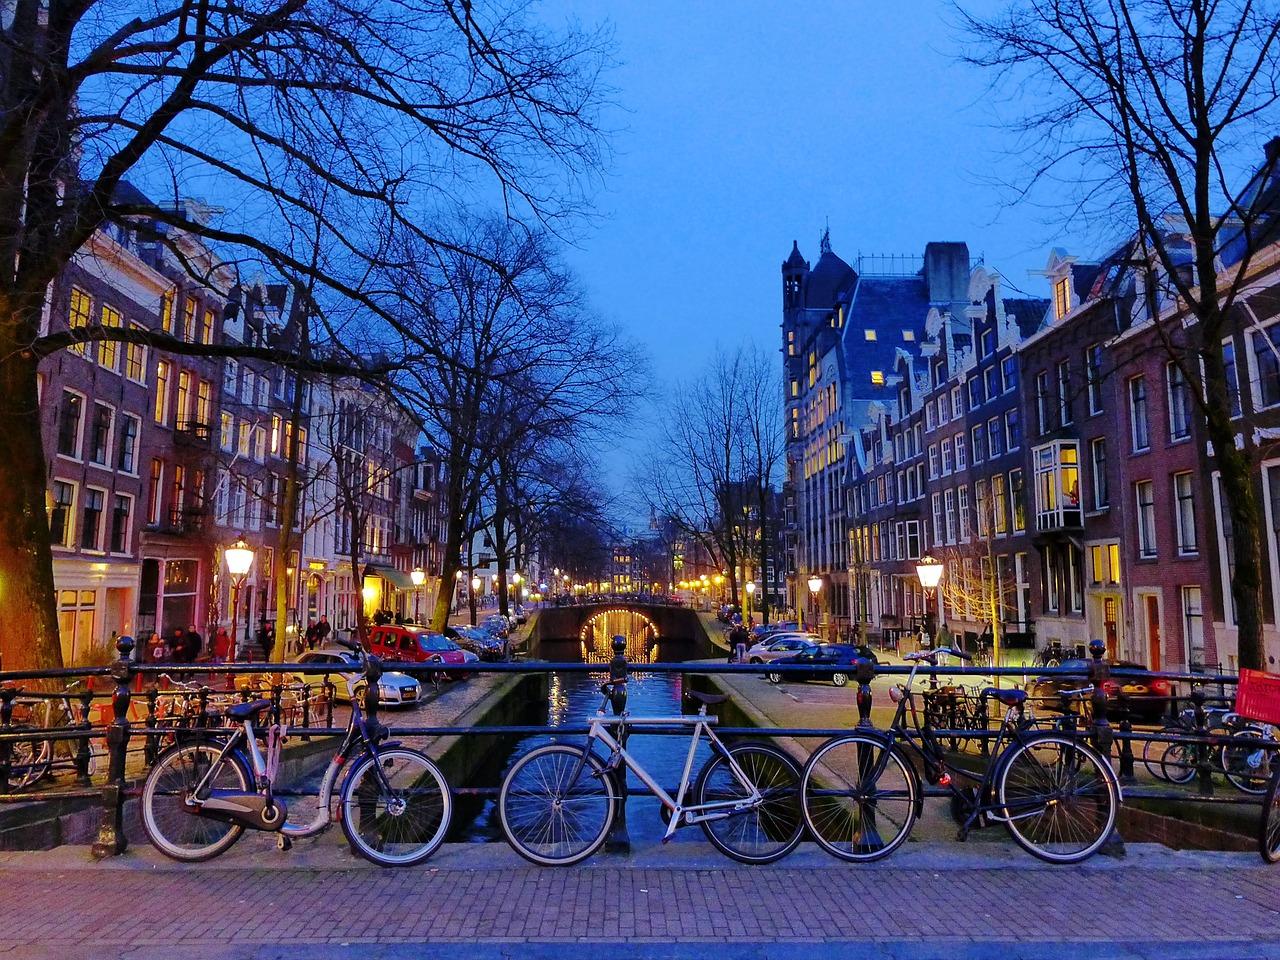 amsterdam-1243233_1280.jpg